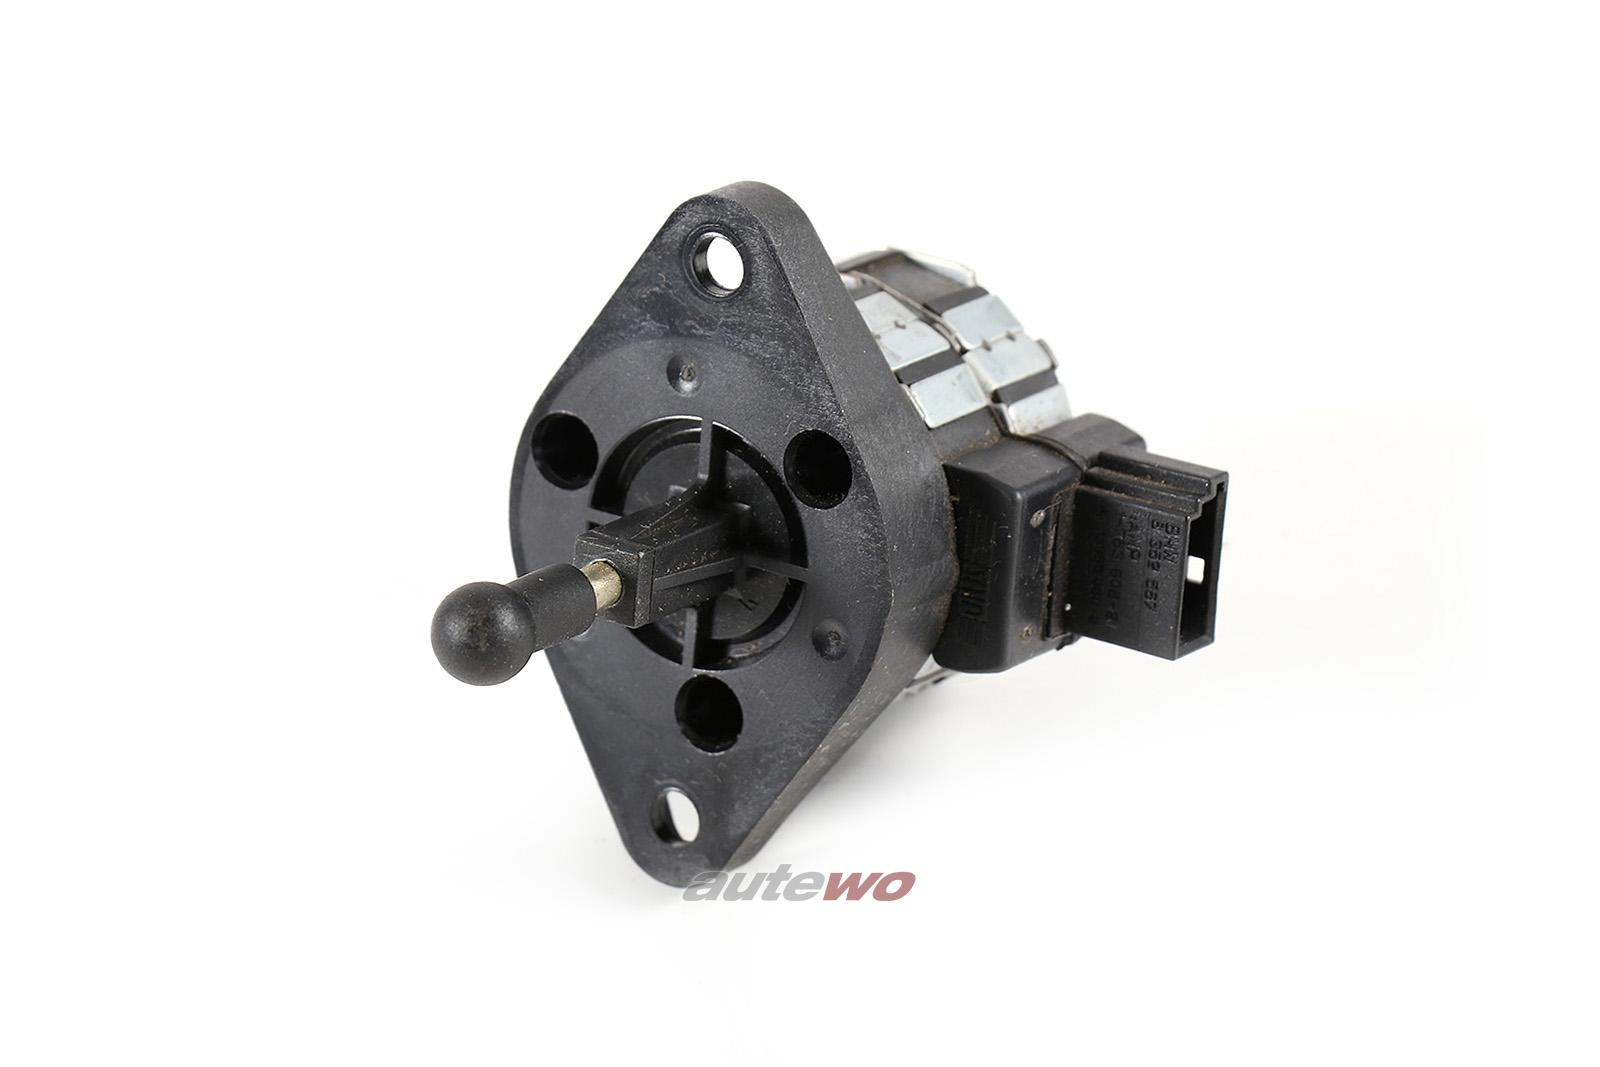 4B0941293 4B3941295 Audi A6/S6/RS6 4B Stellmotor Leuchtweitenregulierung